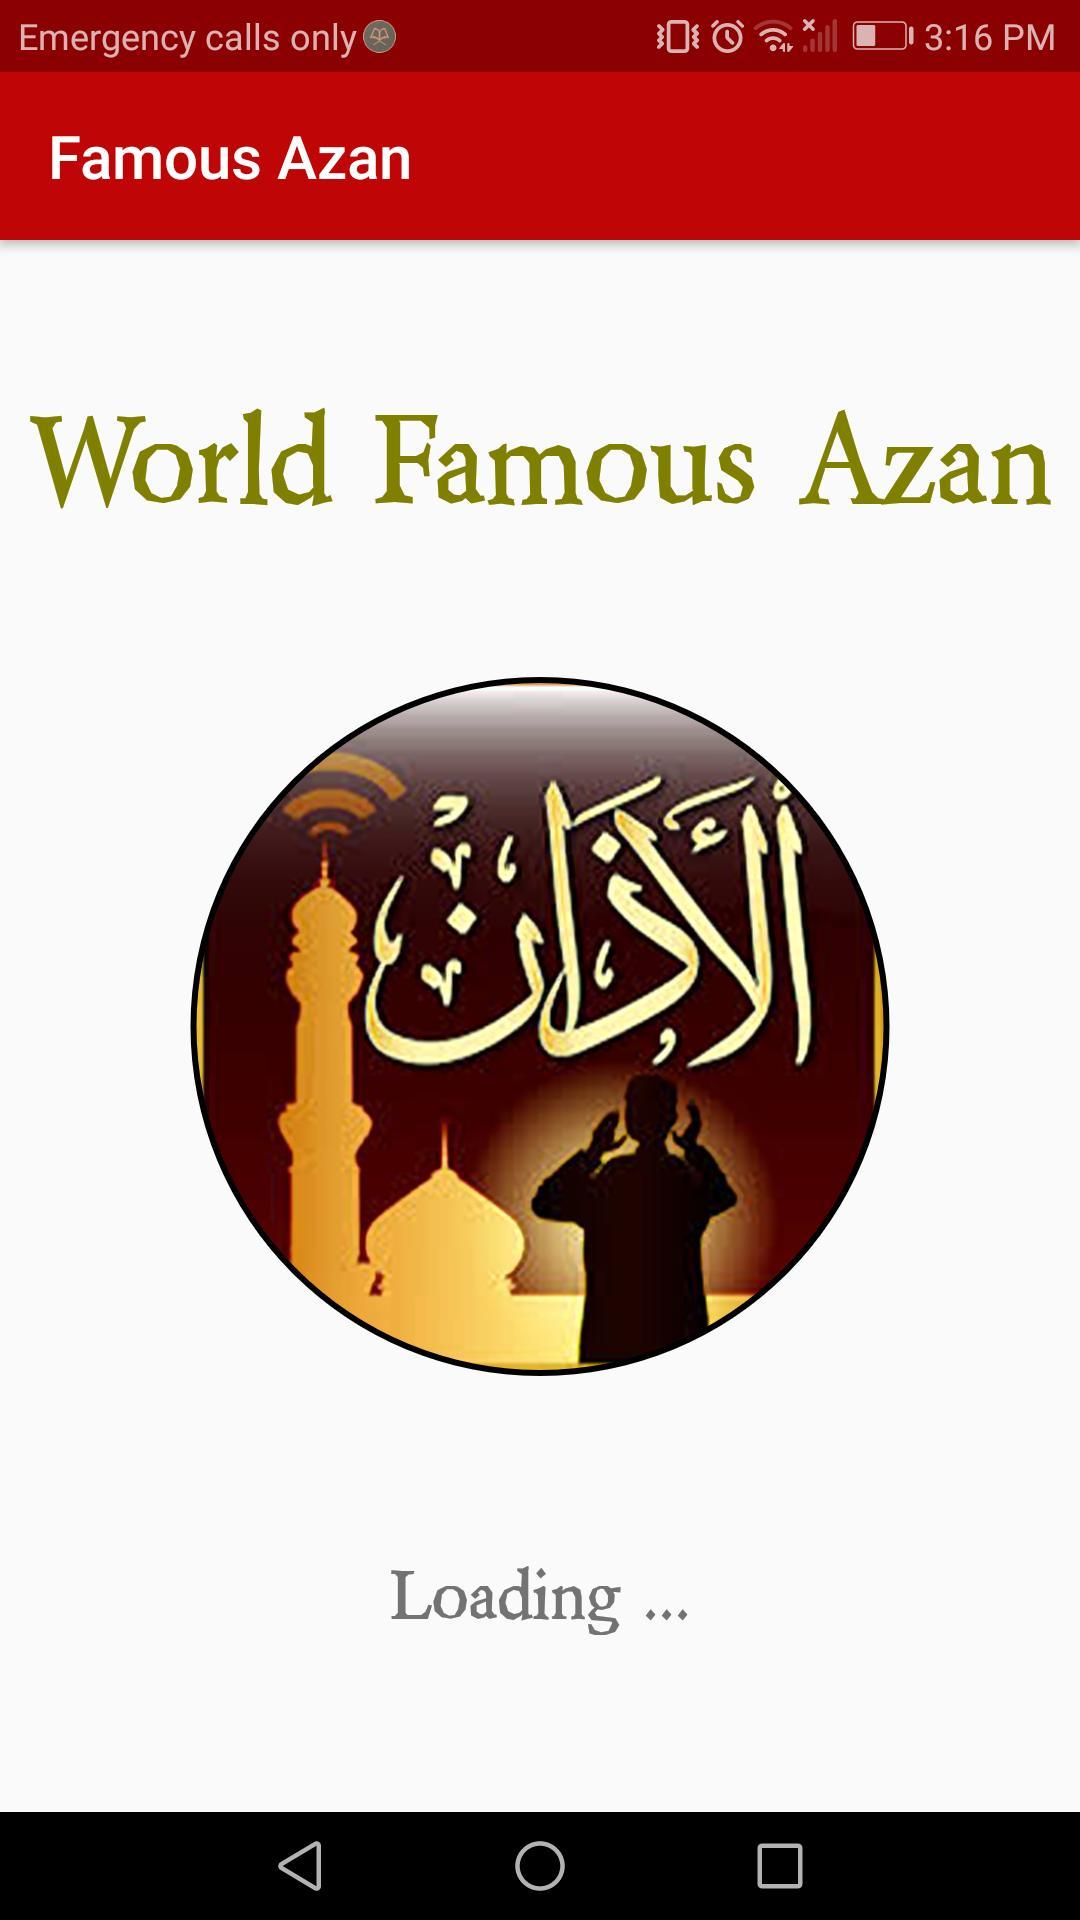 Most Beautiful Azan Sounds mp3 Ringtones Alarm for Android - APK